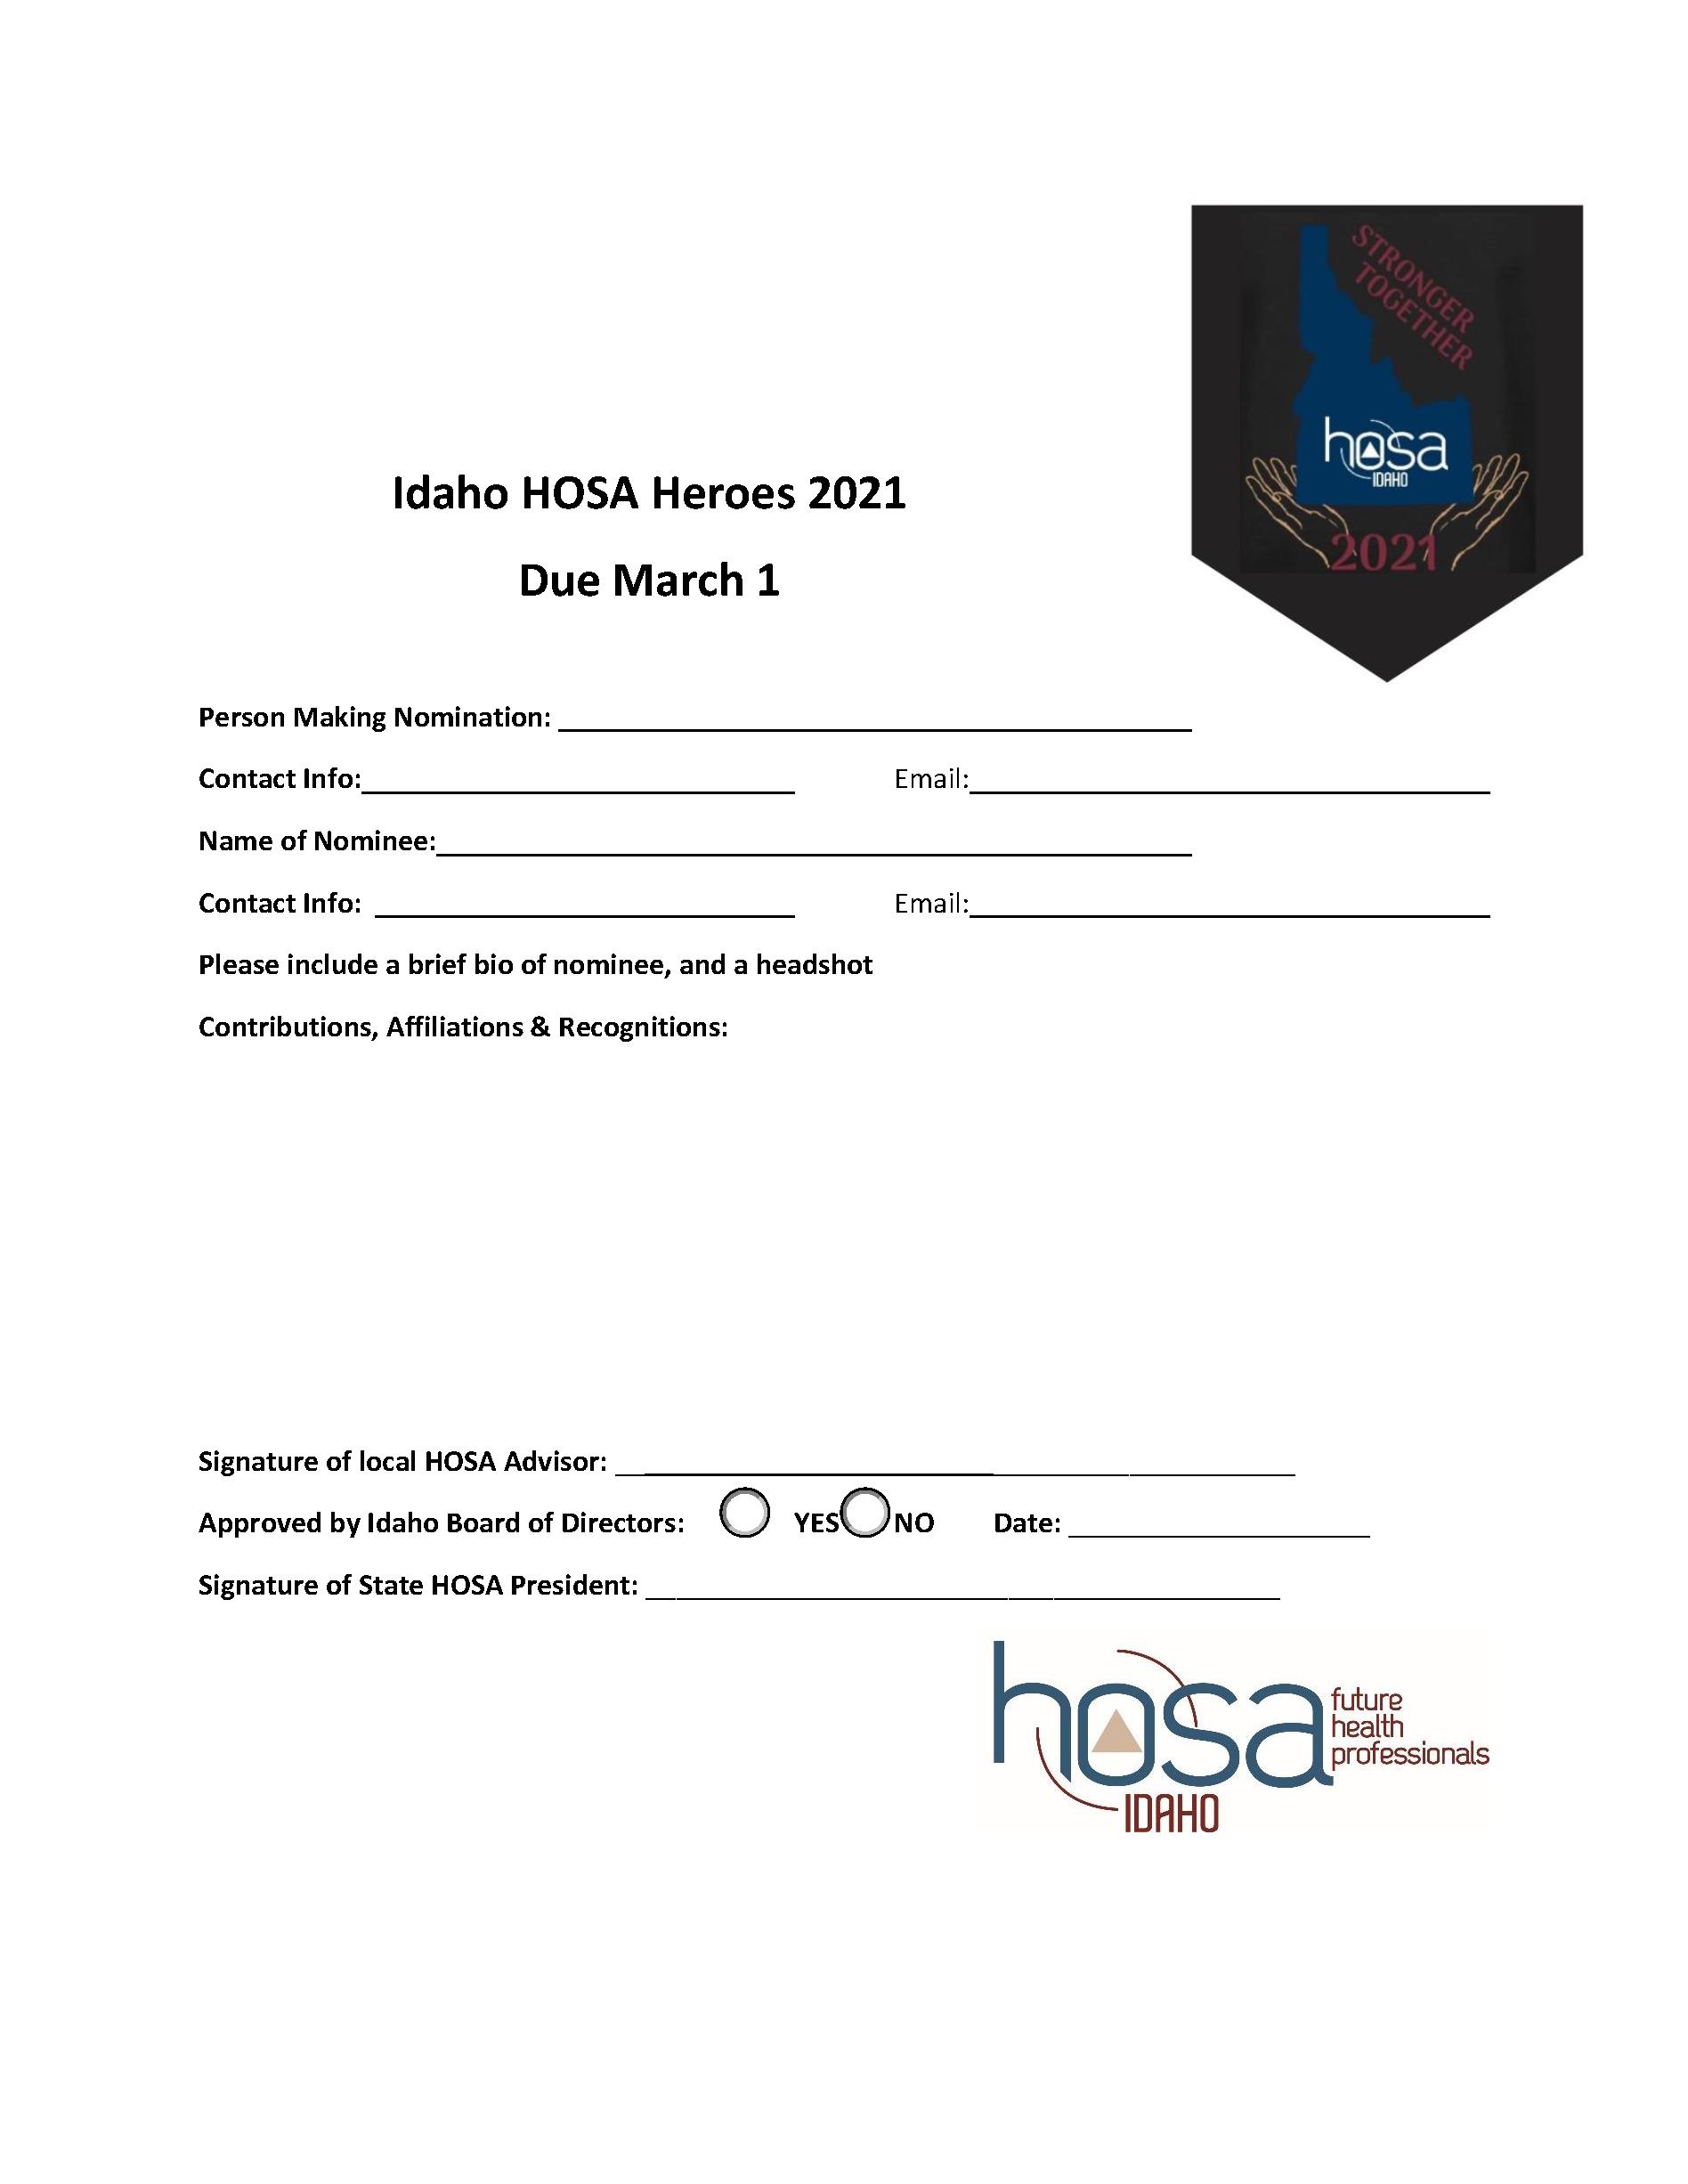 BLANK HOSA Heroes application 2021- fillable